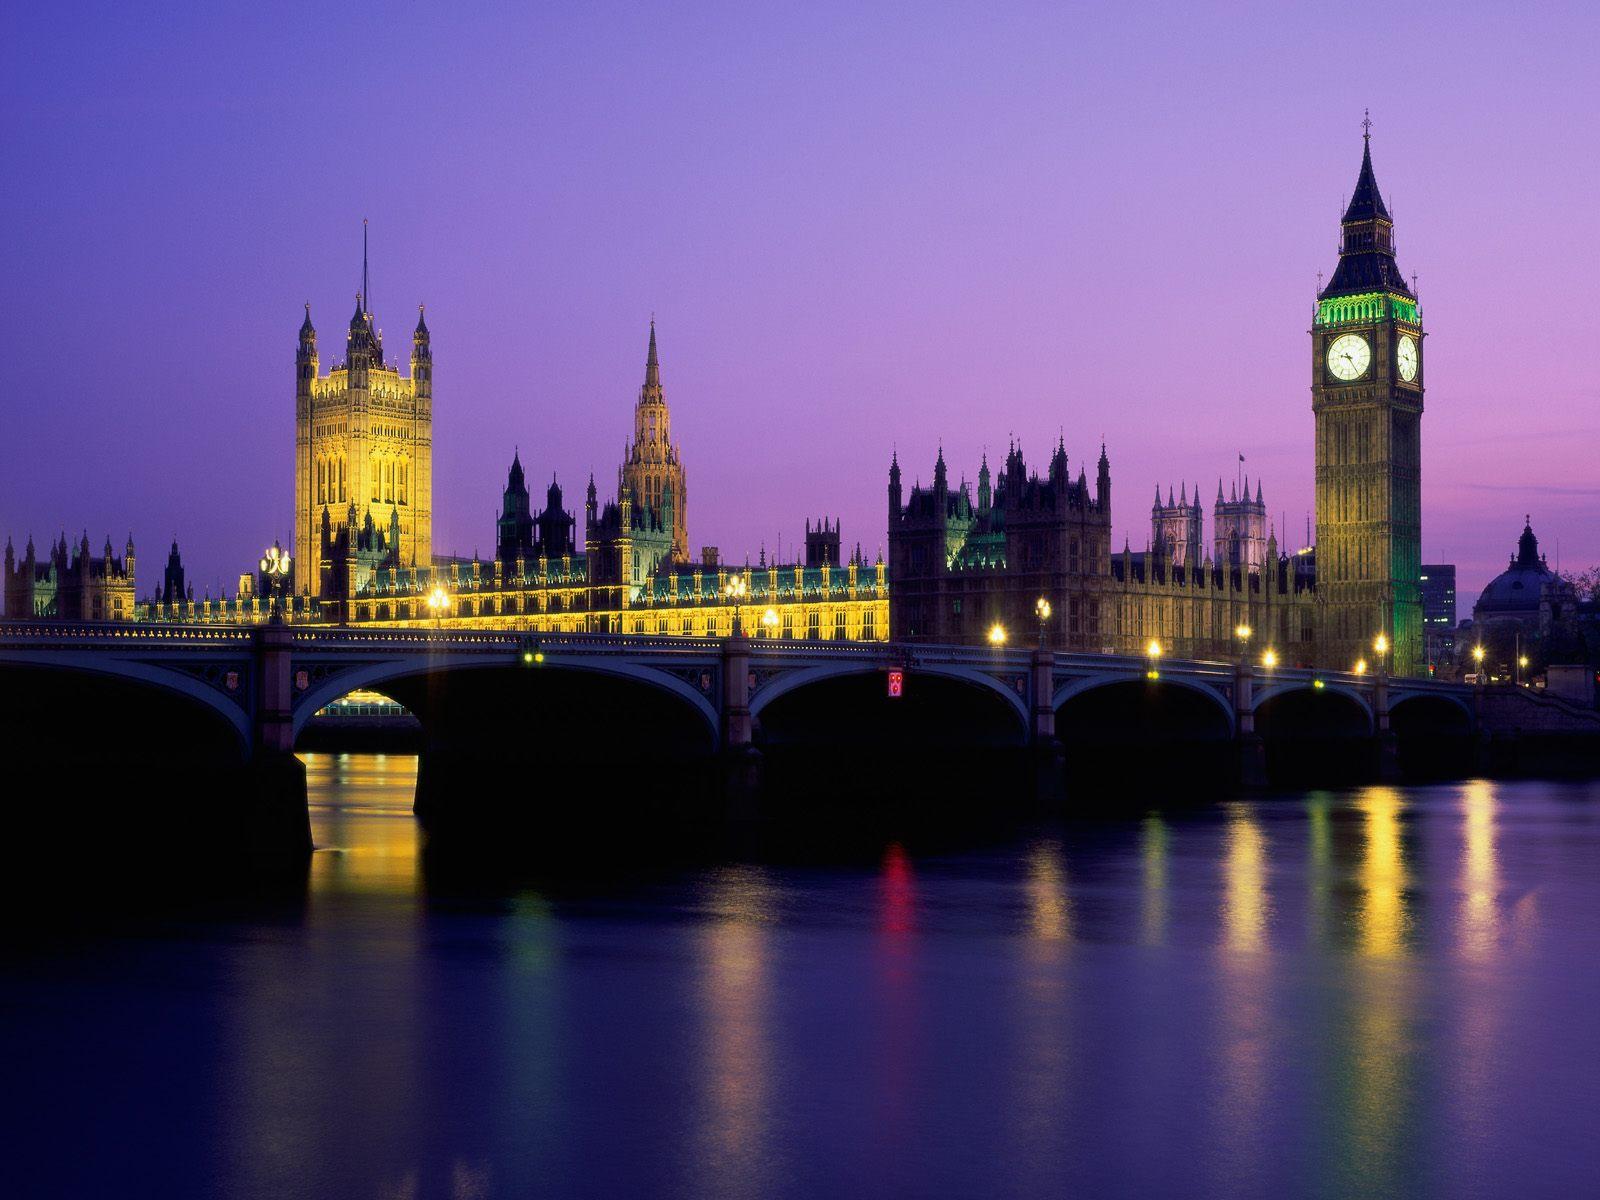 of Parliament London England   England Photography Desktop Wallpapers 1600x1200